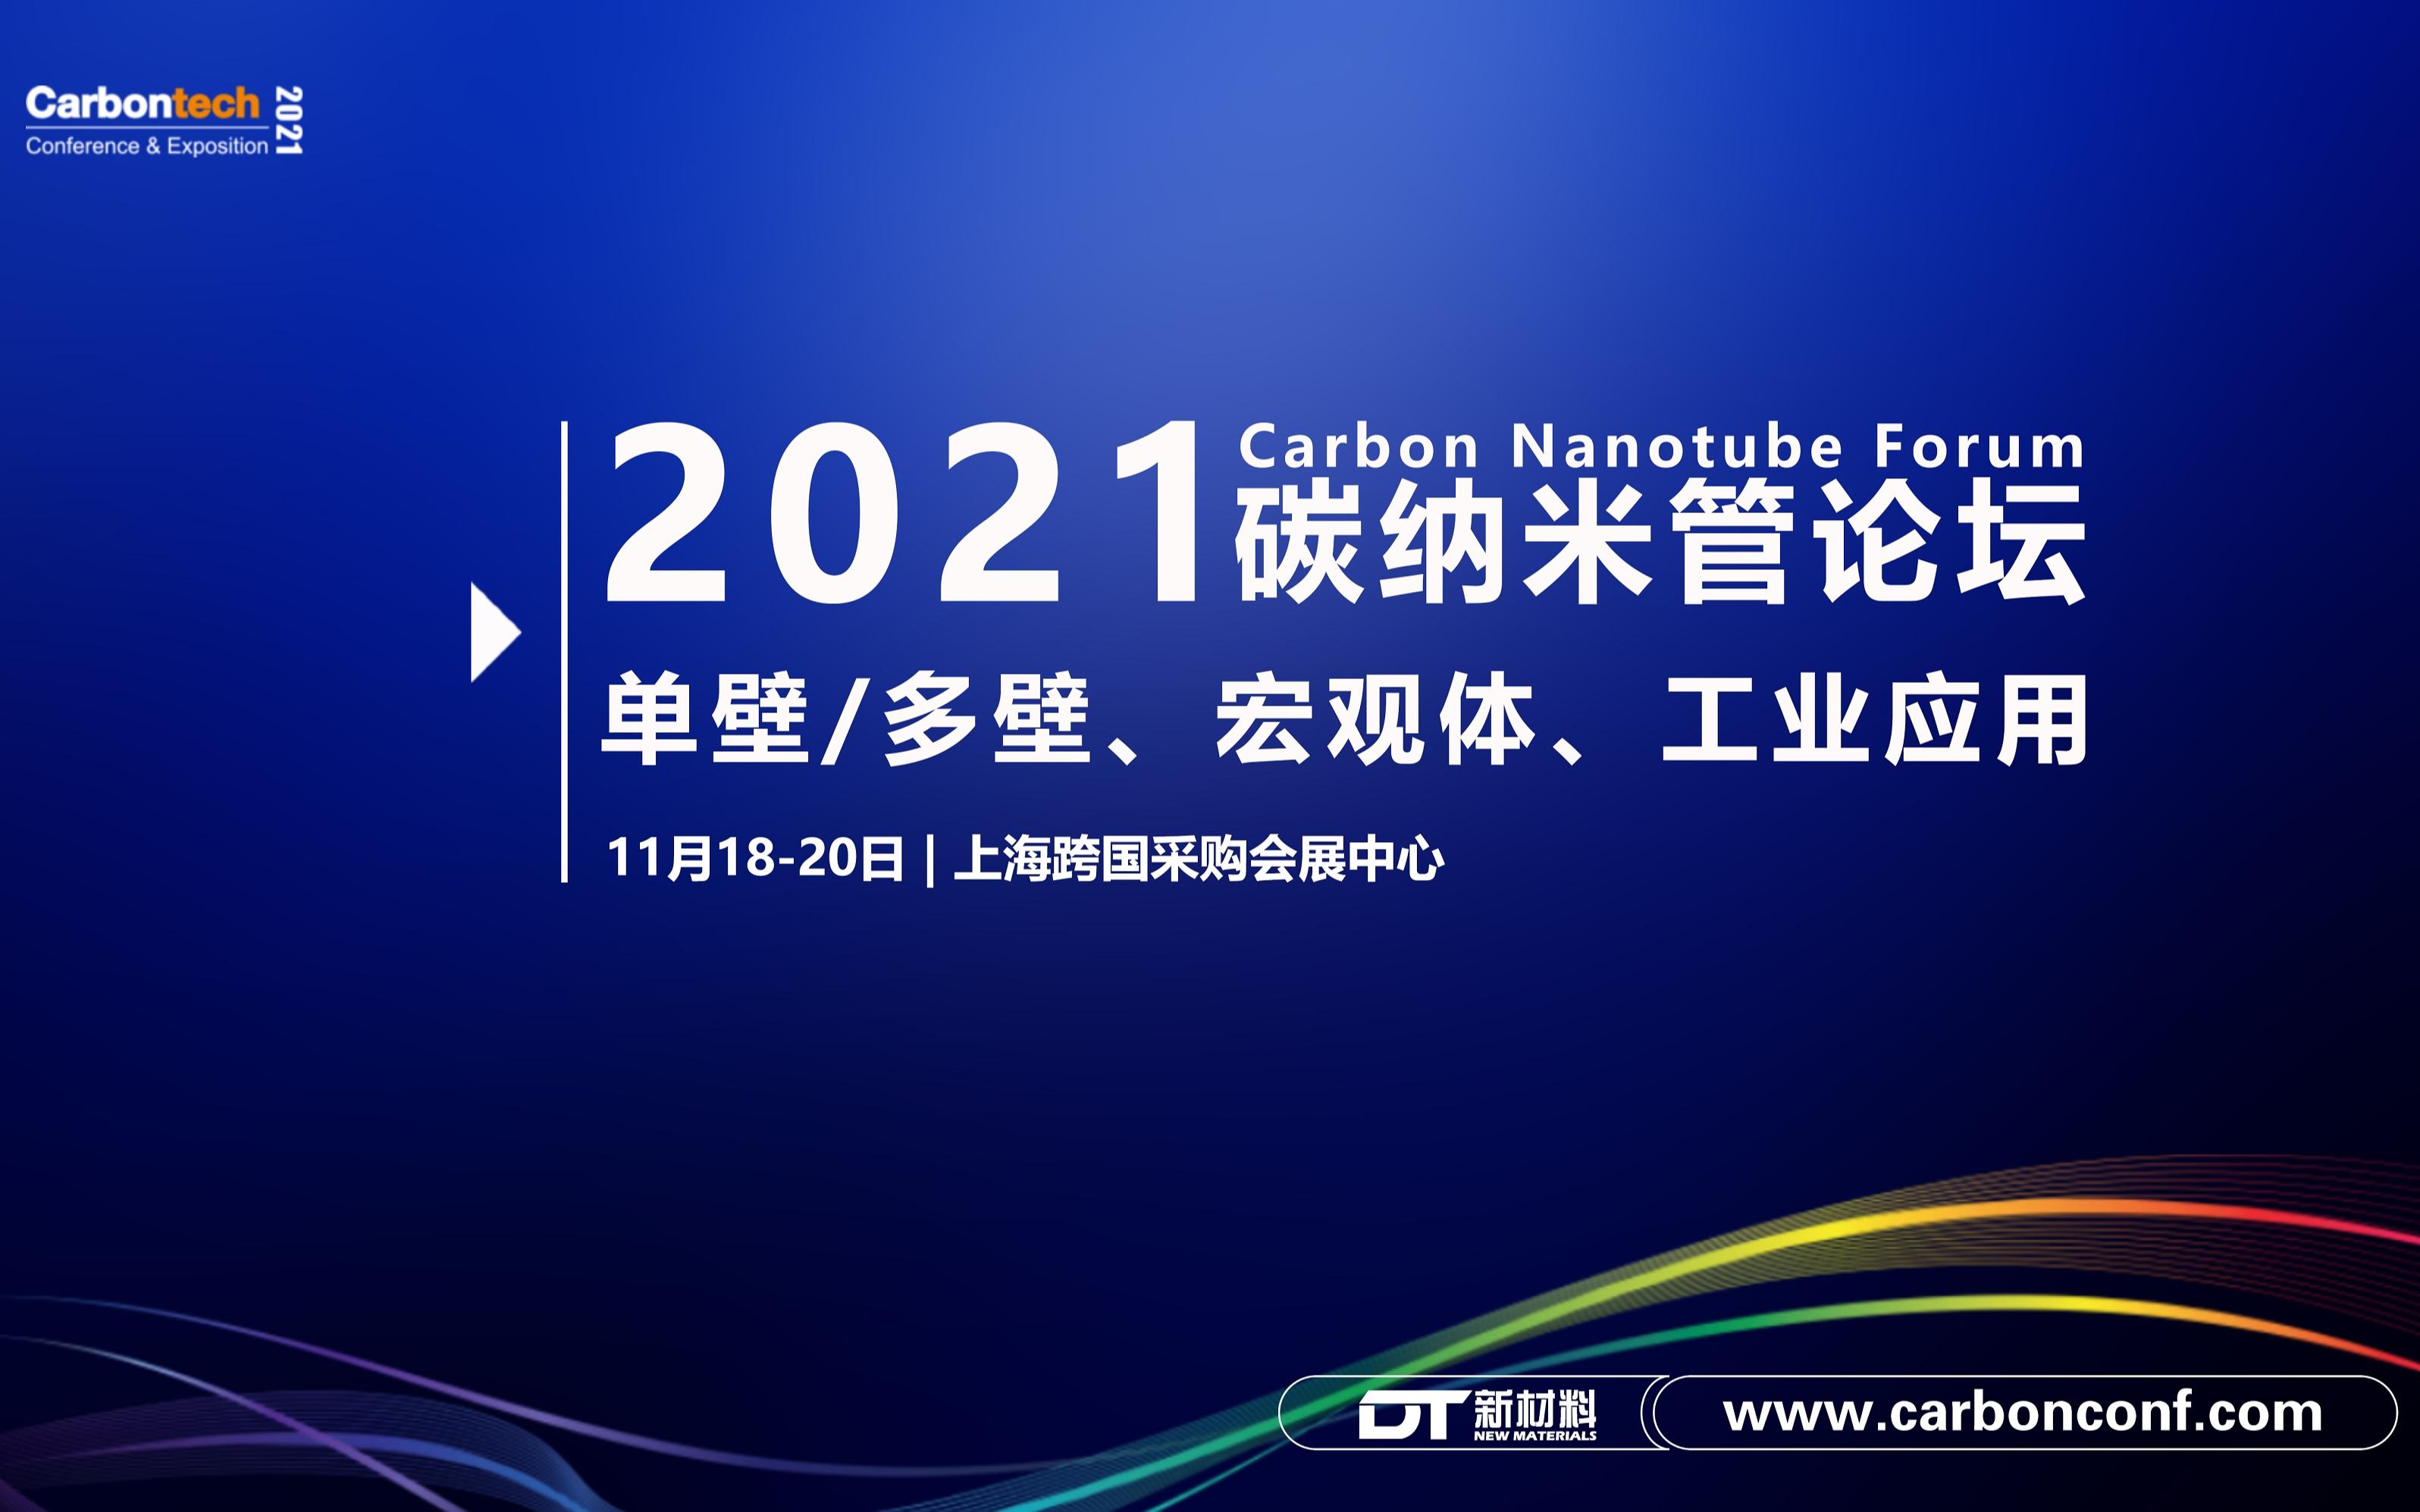 Carbontech 2021碳纳米管论坛